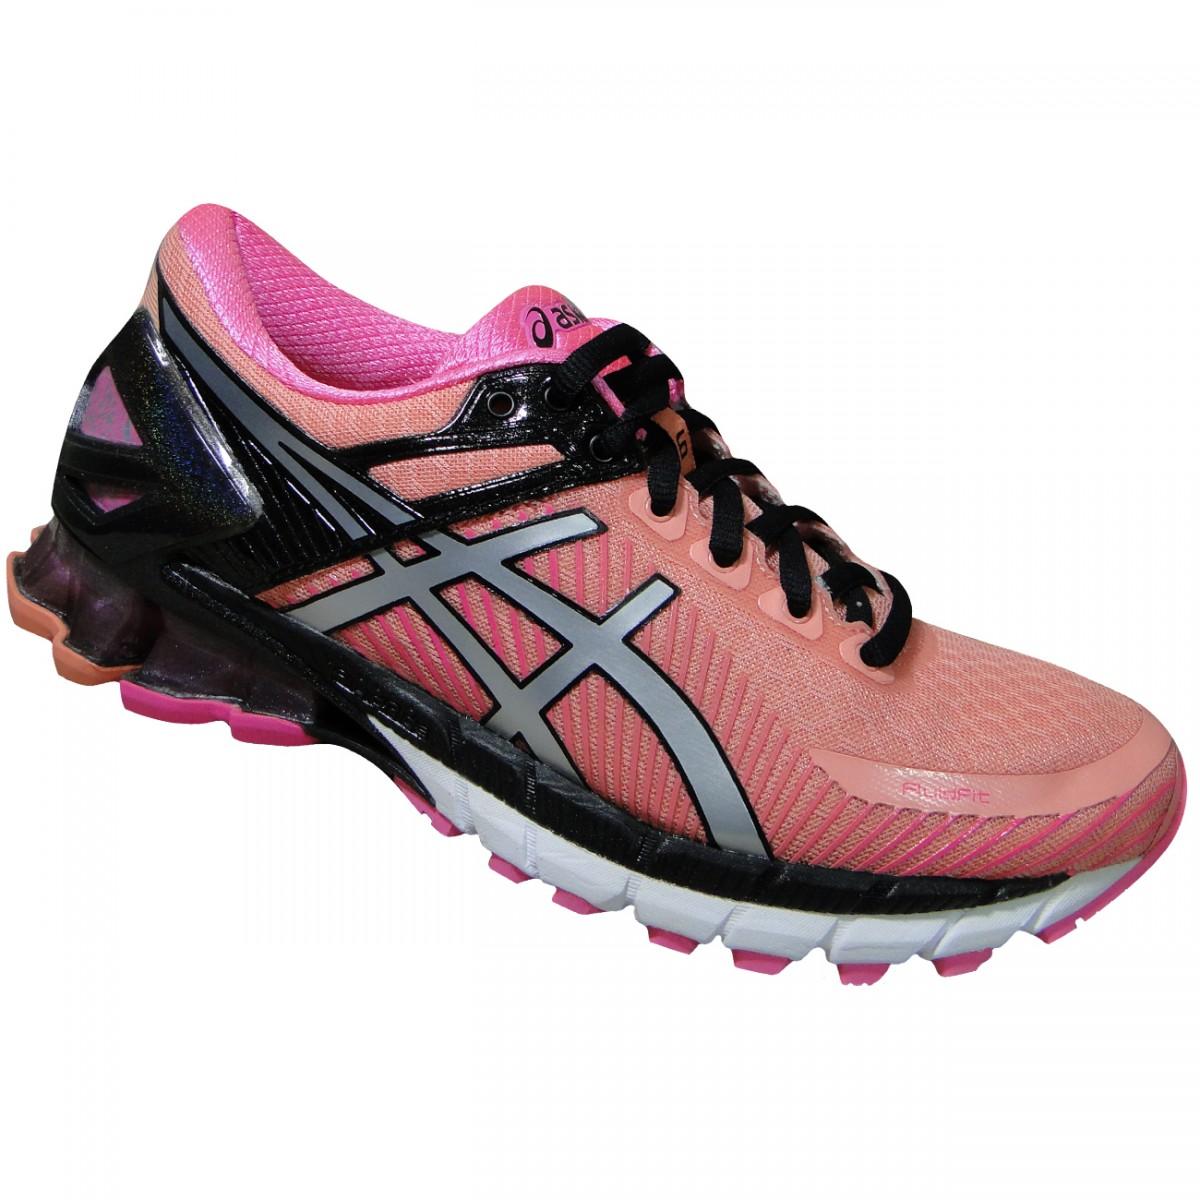 d71fe788ac Tenis Asics Gel-Kinsei 6 T692N 7693 - Coral Preto Pink - Chuteira Nike